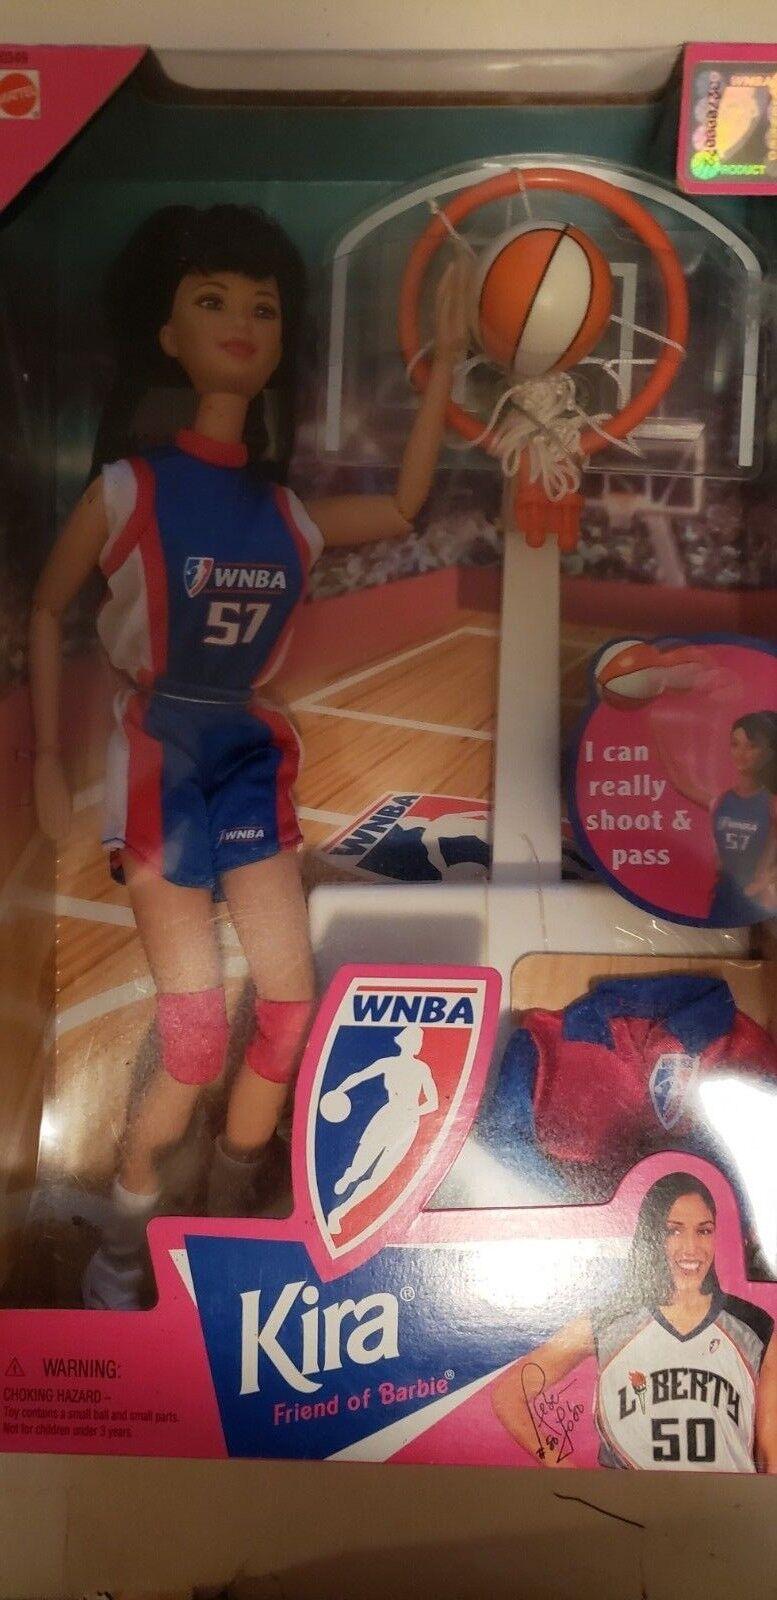 Friend of Barbie WNBA Basketball Kira Doll #20349 Mattel 1998 Really Shoots NIB